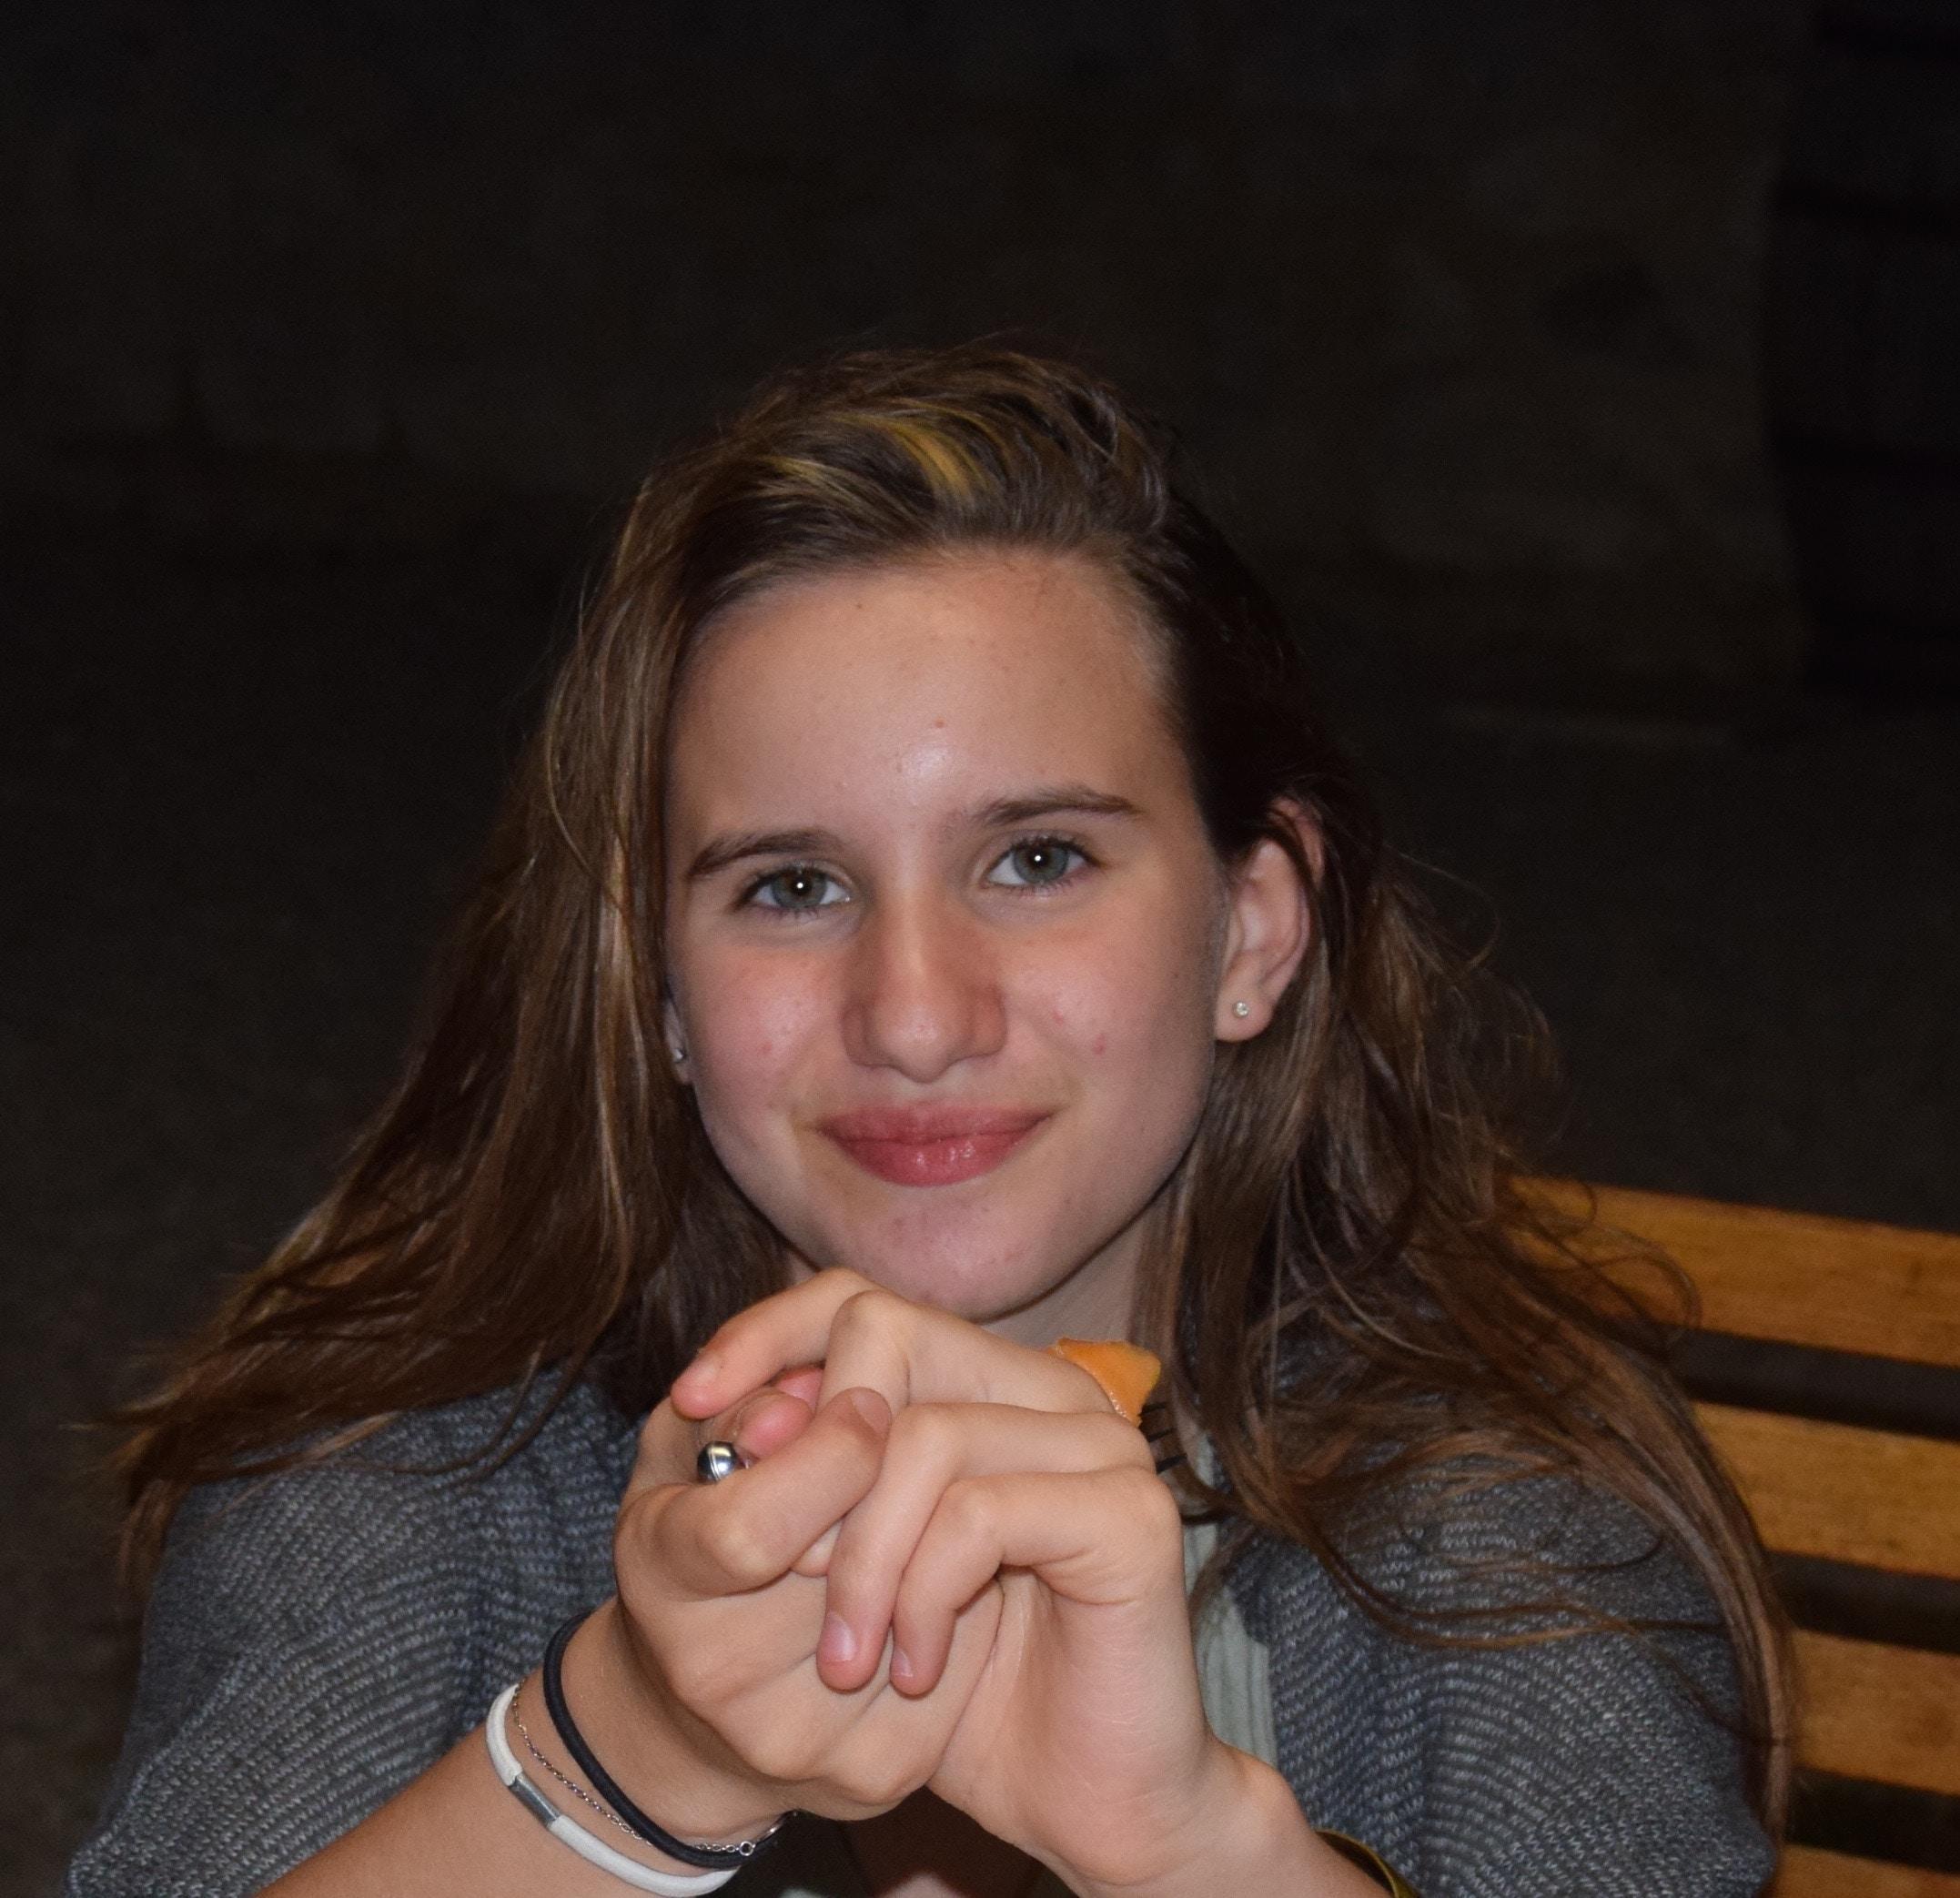 Go to elena schneider's profile